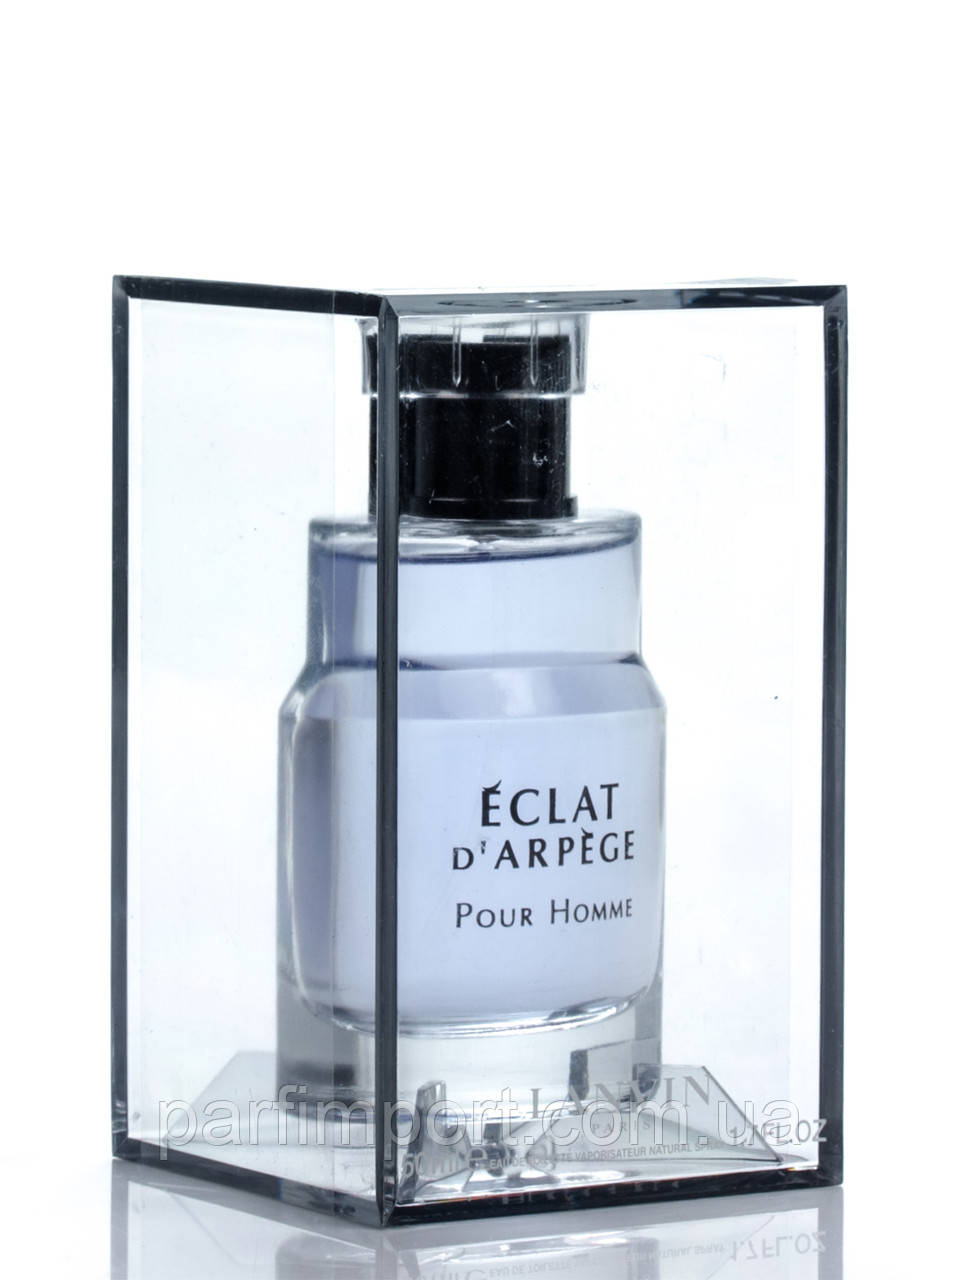 Lanvin ECLAT D'ARPEGE Homme EDT 50 ml туалетная вода мужская (оригинал подлинник  Франция)